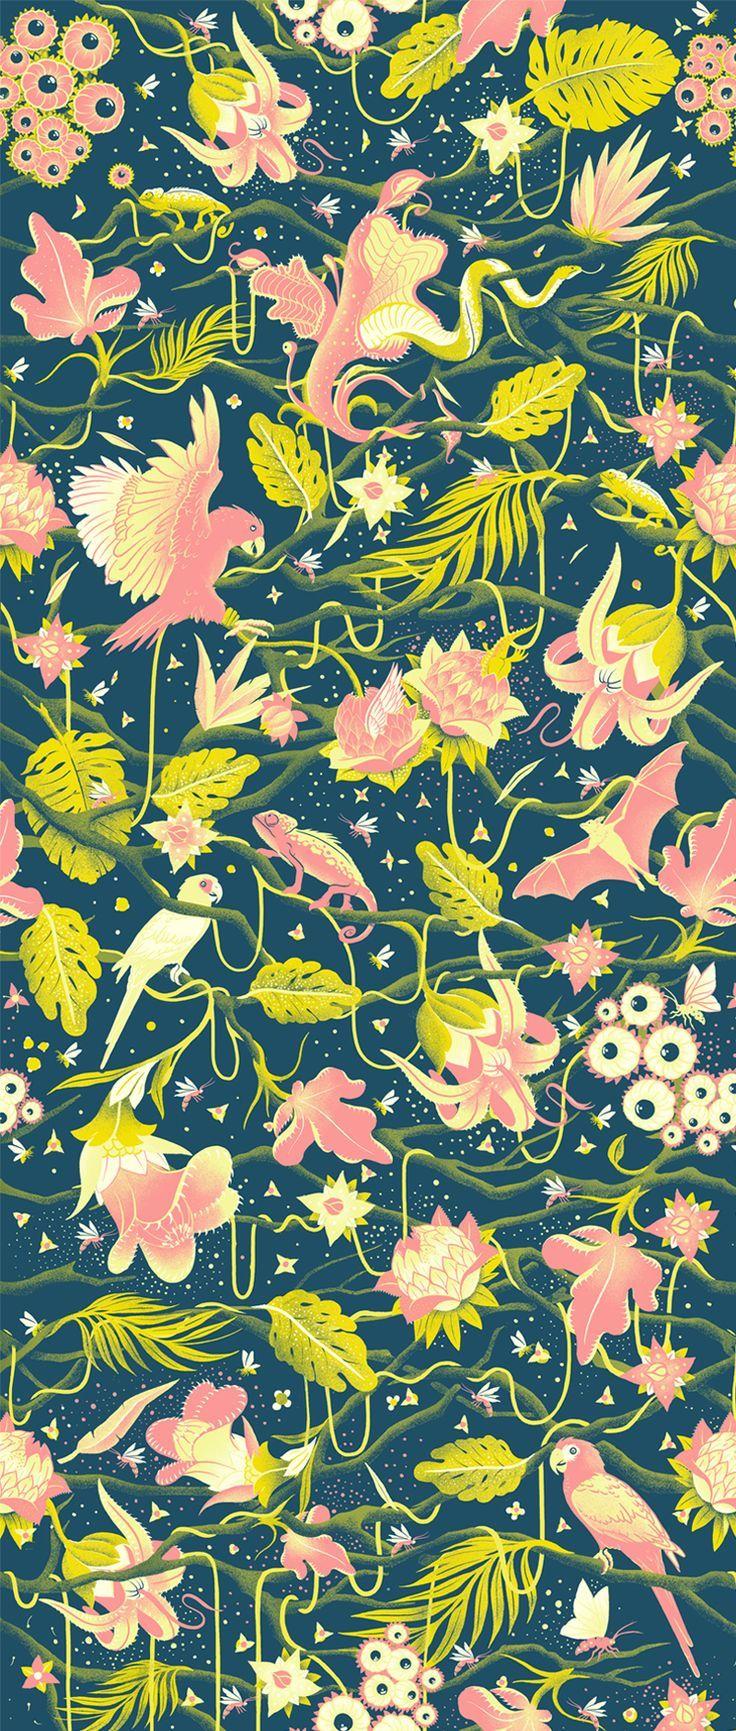 145 best fauna patterns images on pinterest print - Bat and poppy wallpaper ...